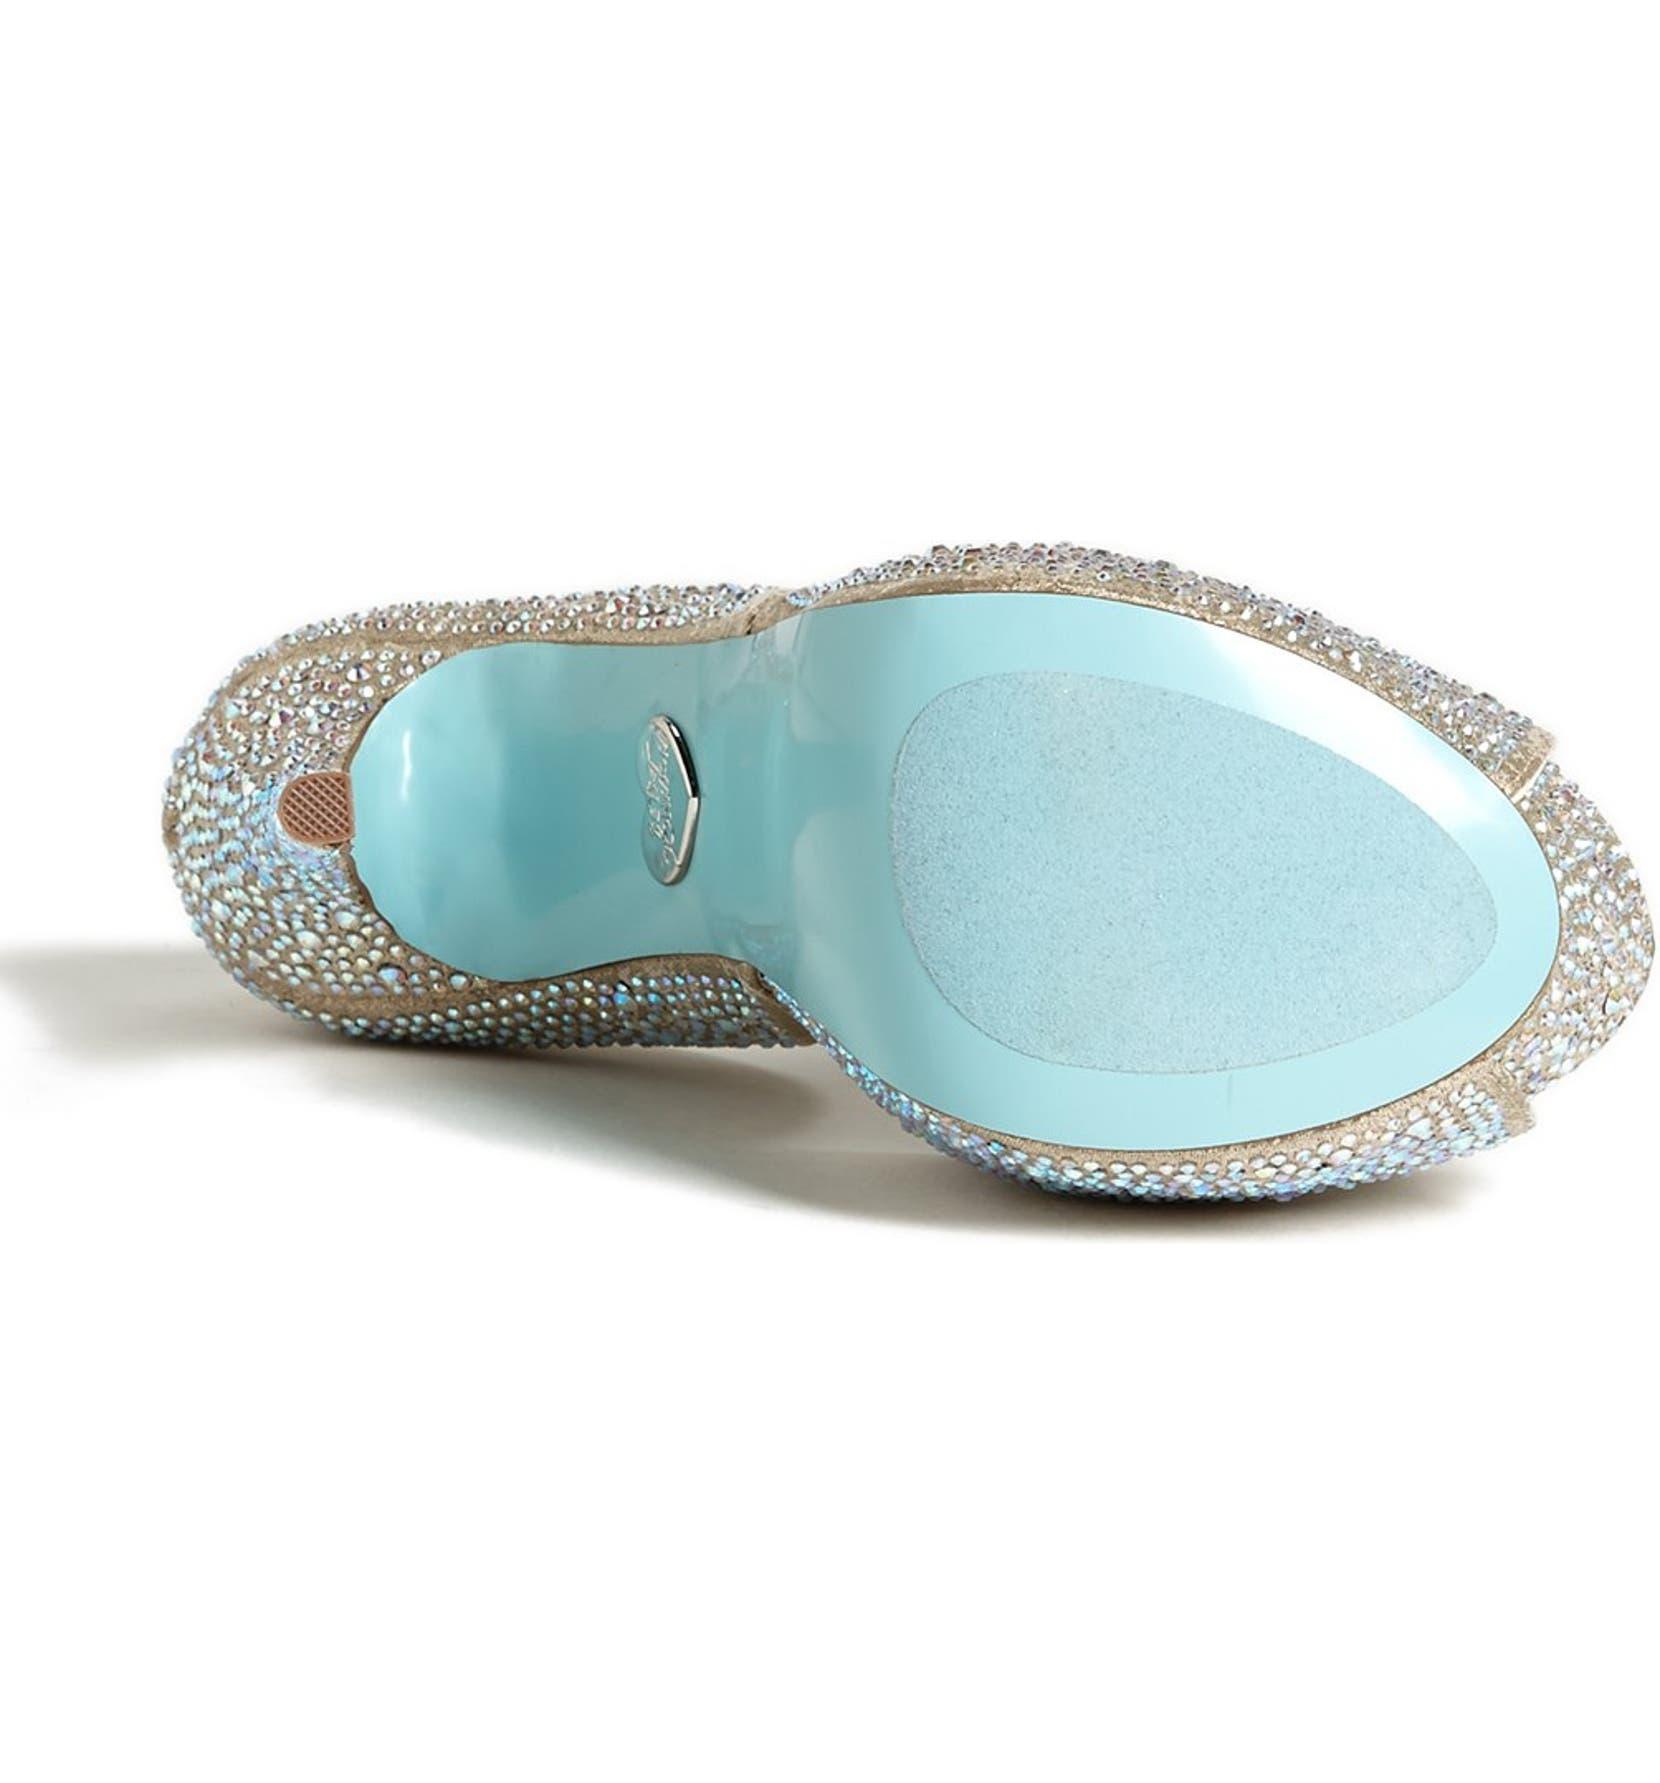 8d08a4dd6a Blue by Betsey Johnson 'SB-Kiss' Sandal | Nordstrom